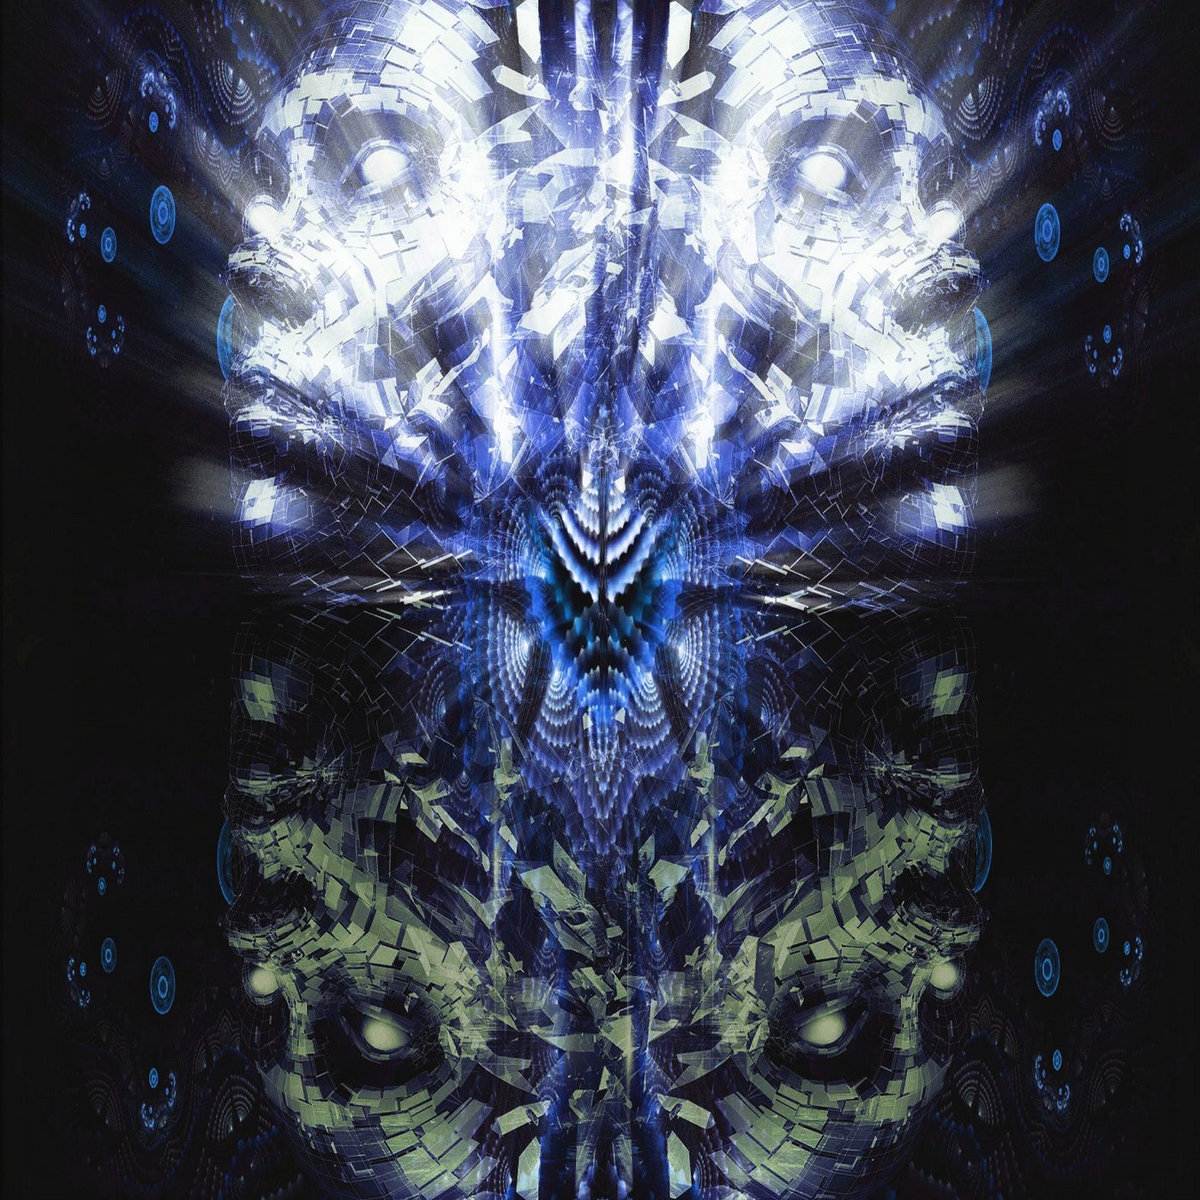 alien discography download